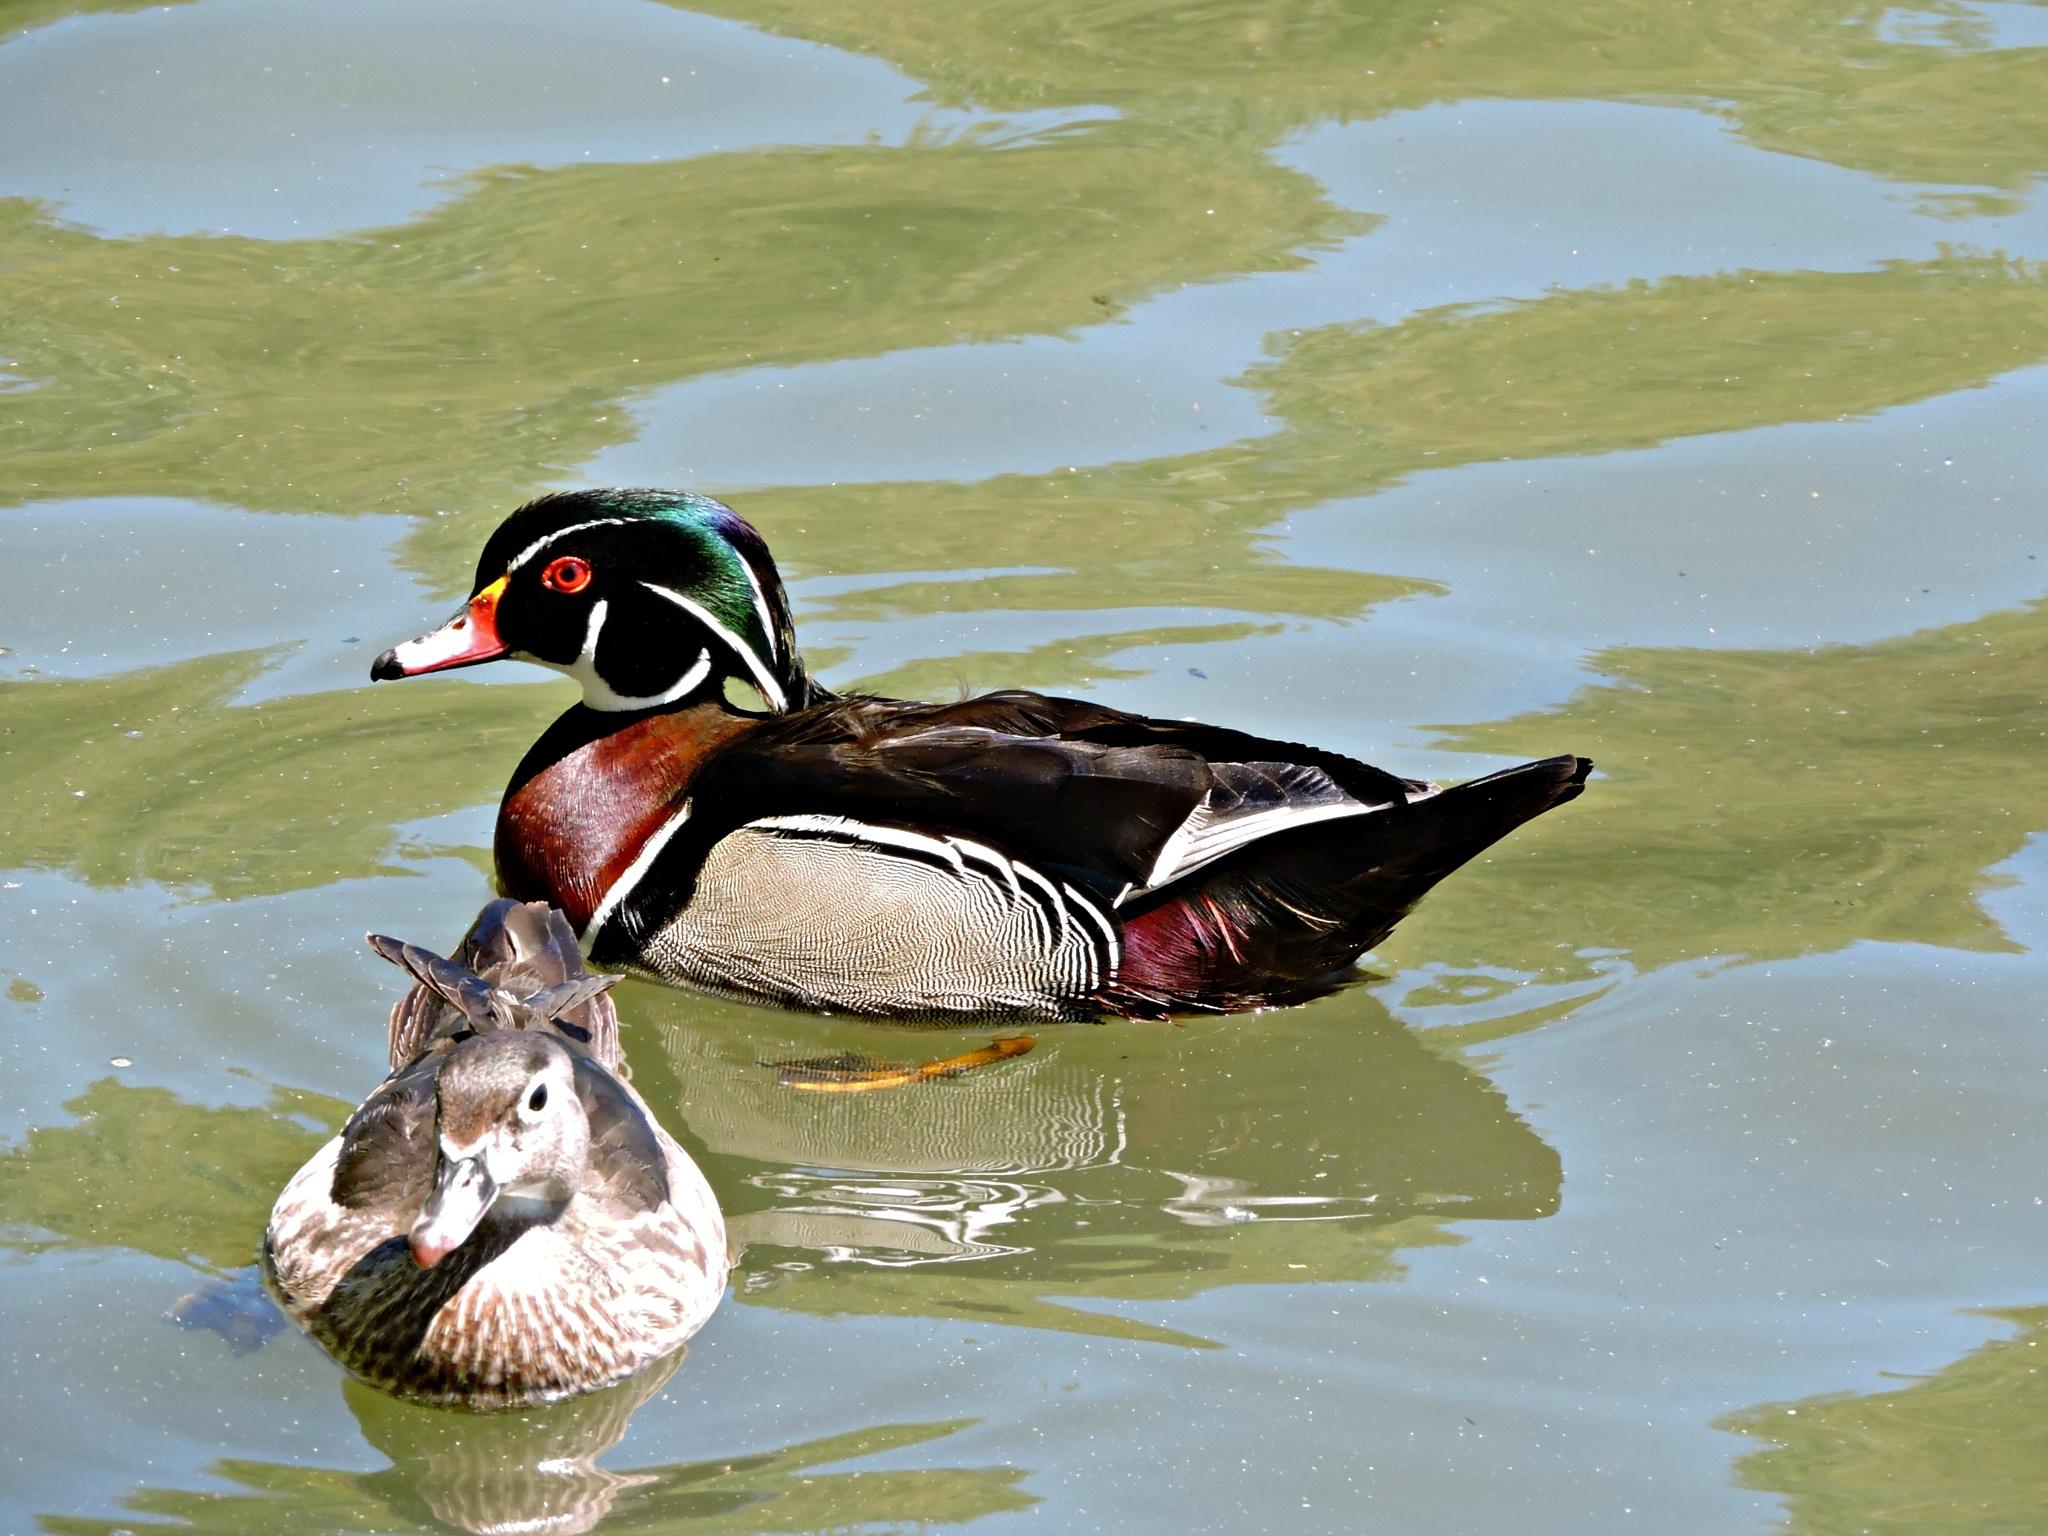 Grumpy Ducks by Janice Bradford